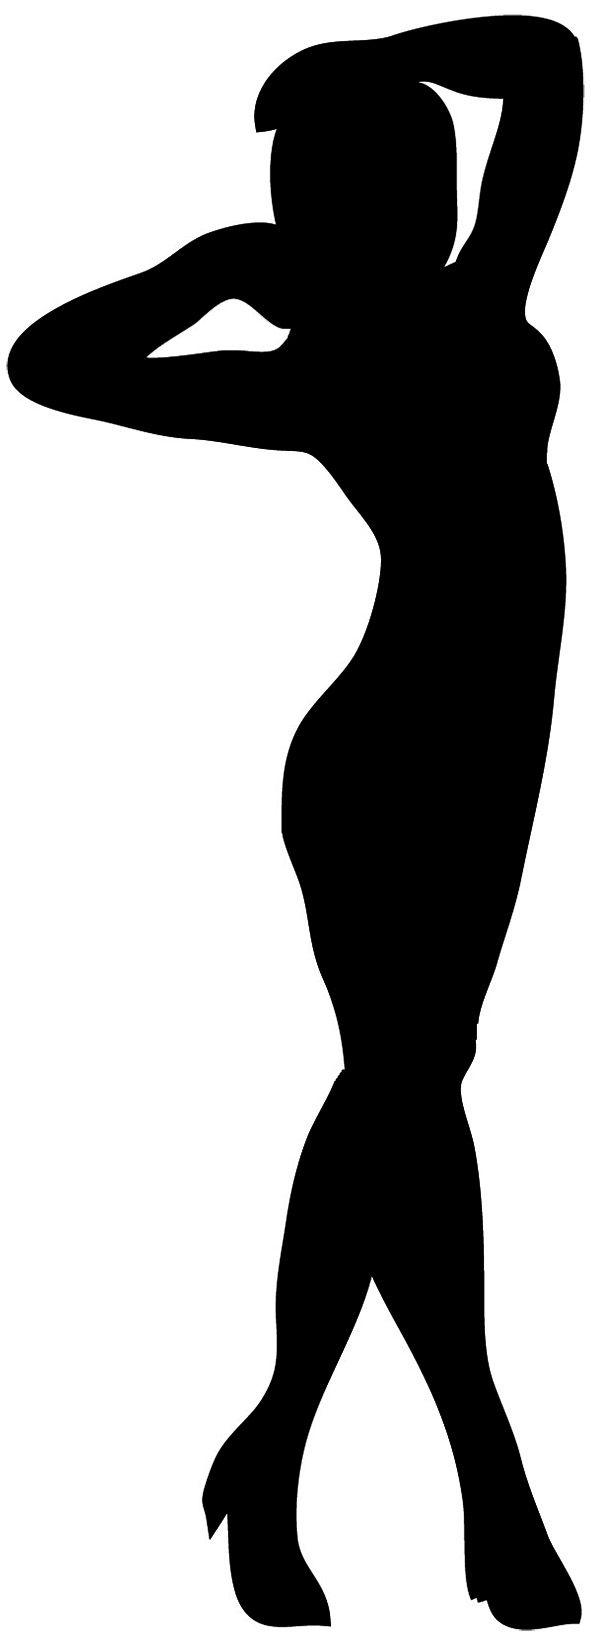 591x1632 Female Silhouette Standing Woman Black Board Pics